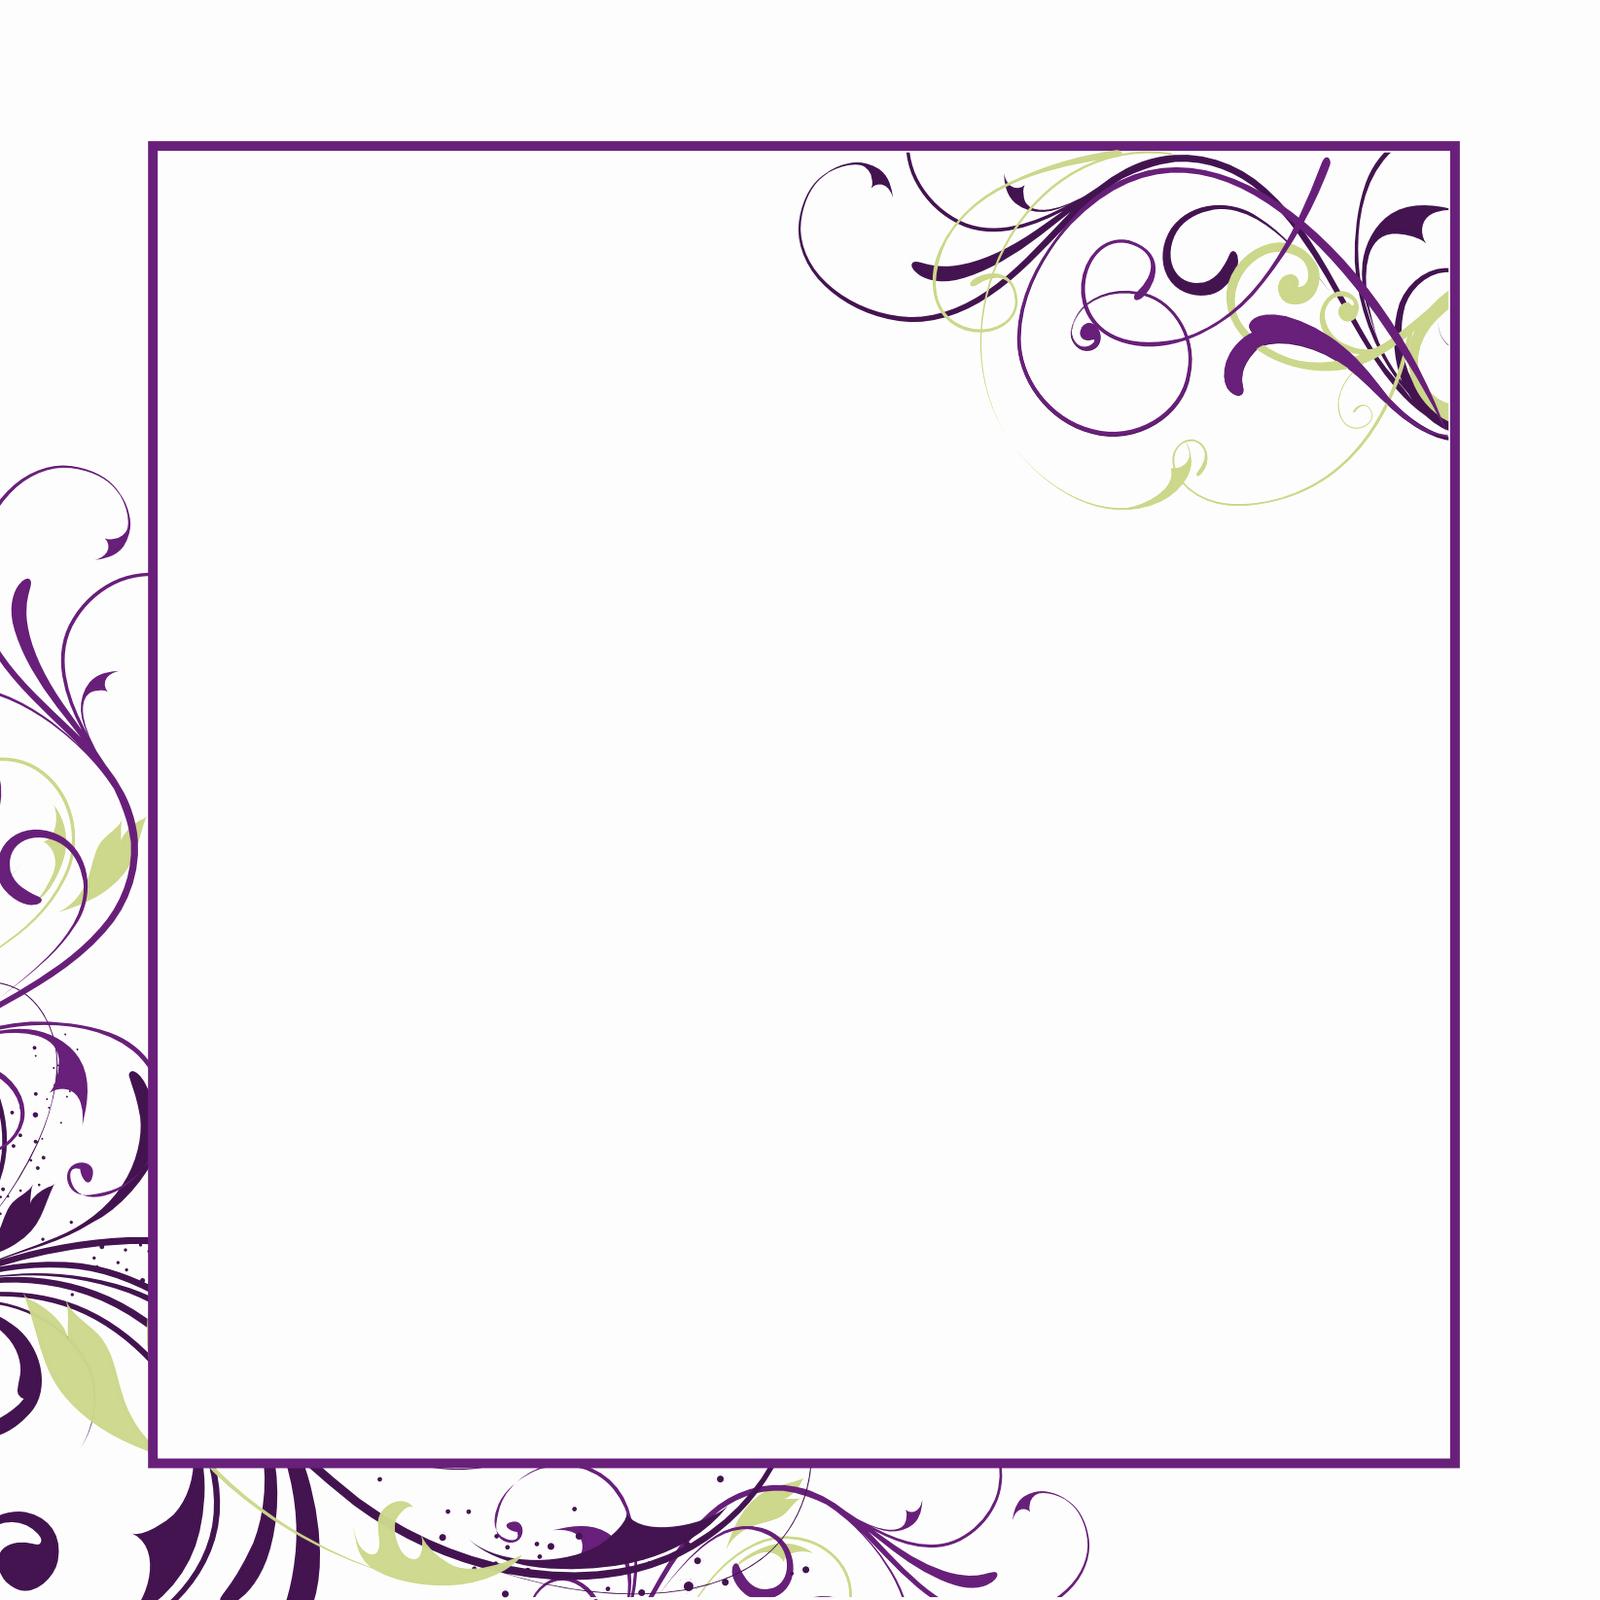 Free Invitation Templates Printable theagiot Mhf4ydhe